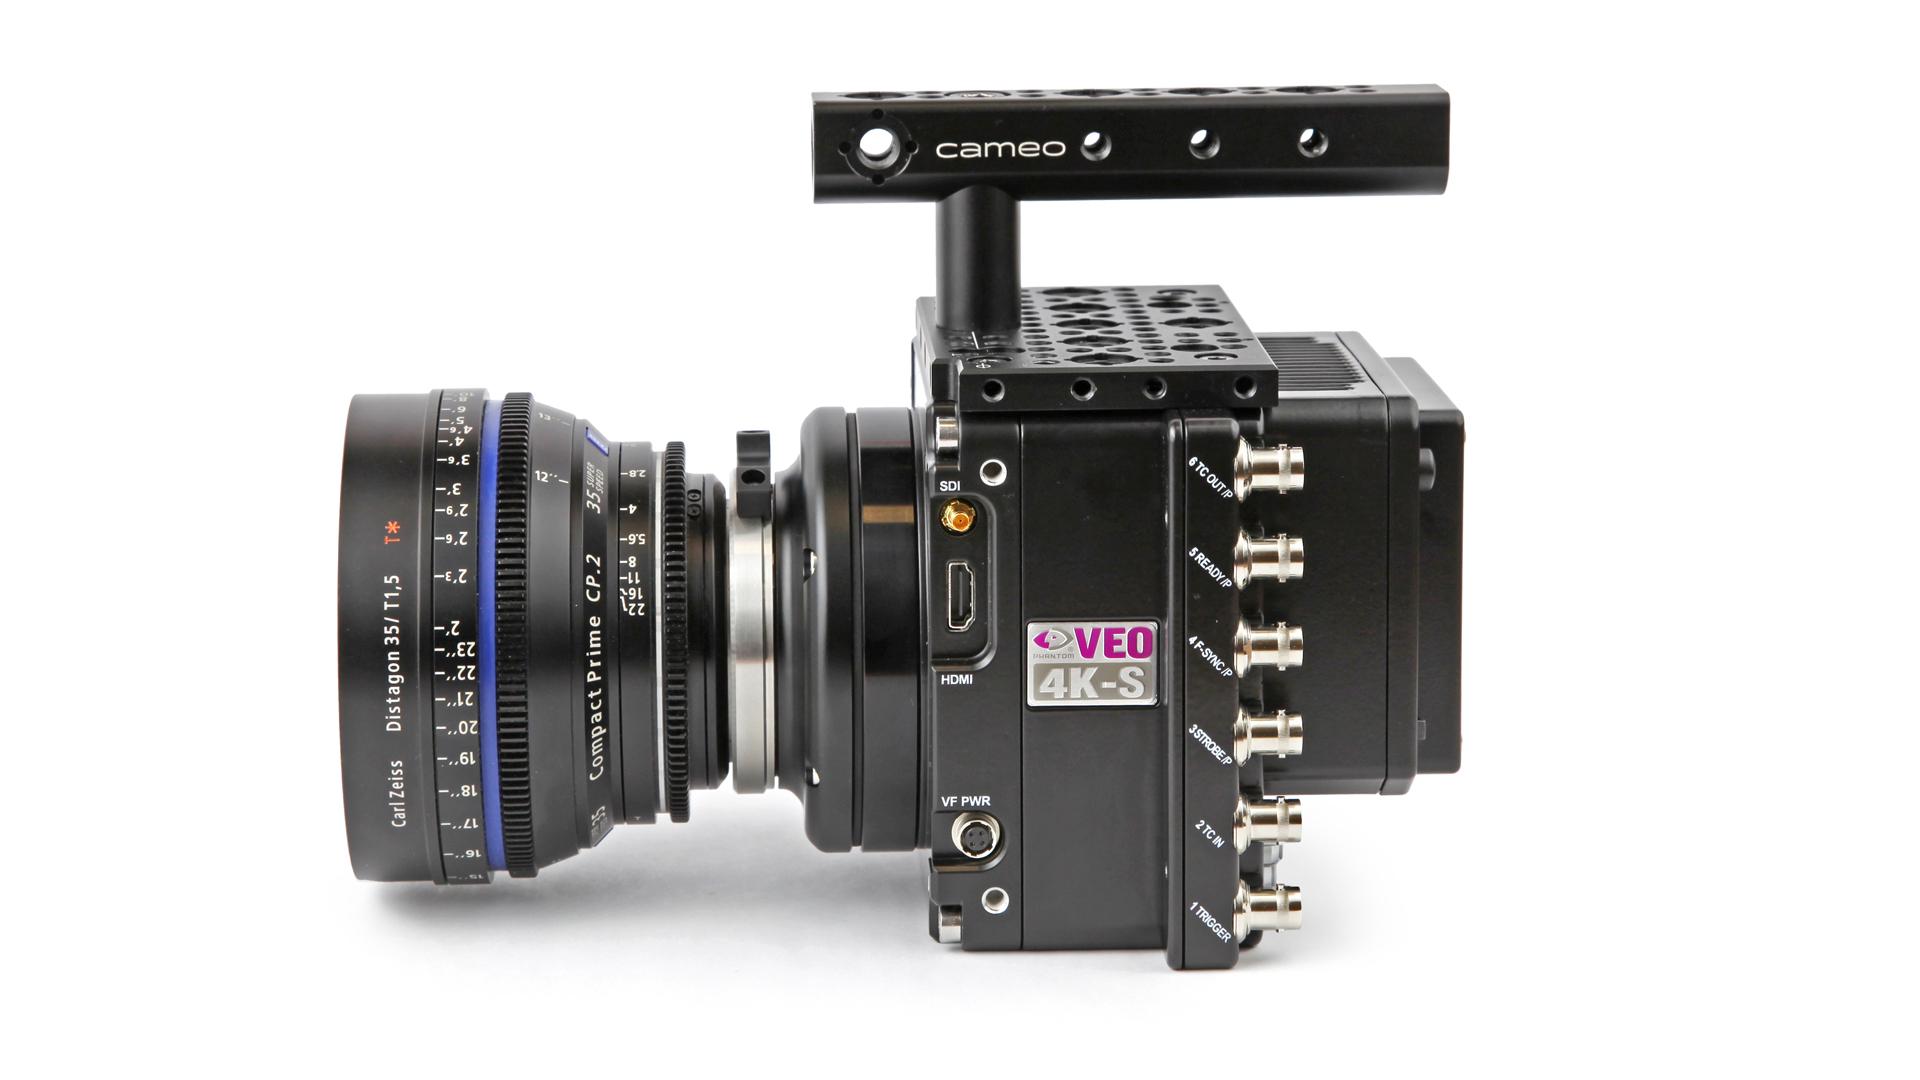 Vision Researchが高速度カメラPhantom VEO 4KPLとPhantom VEO 590Lを発表